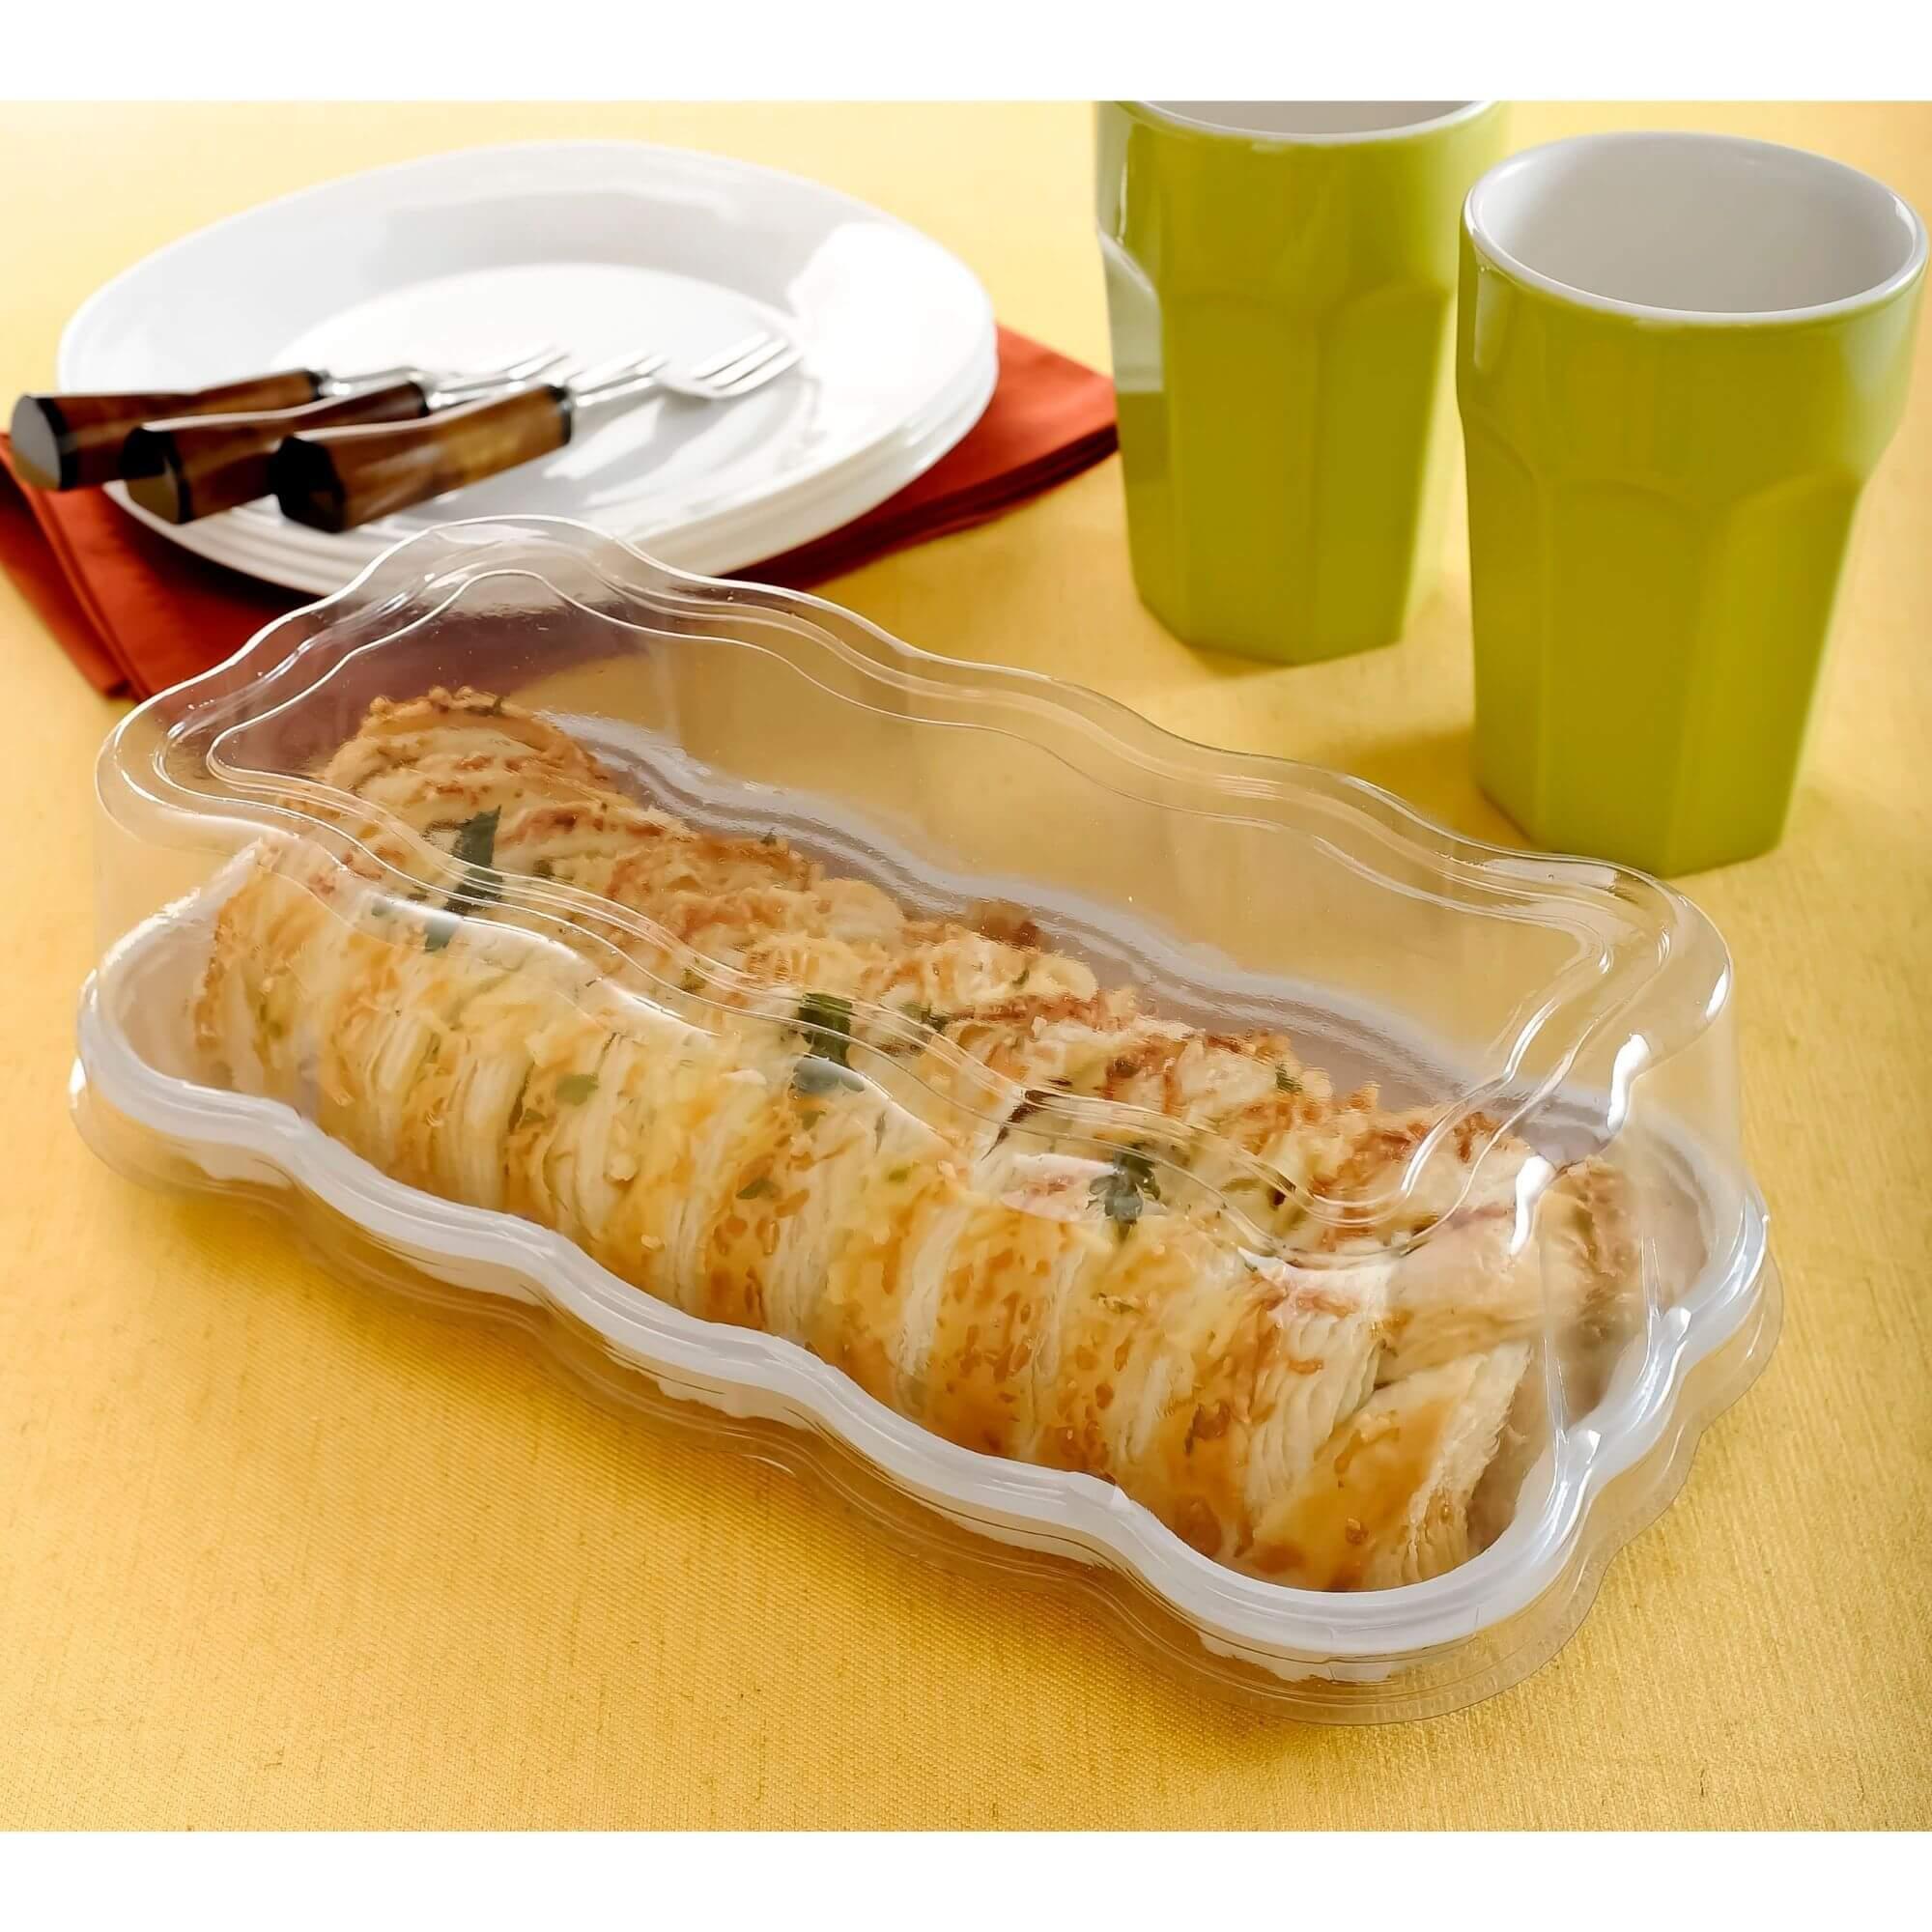 Embalagem rocambole e fatia de torta Catarina 500g - Galvanotek G61